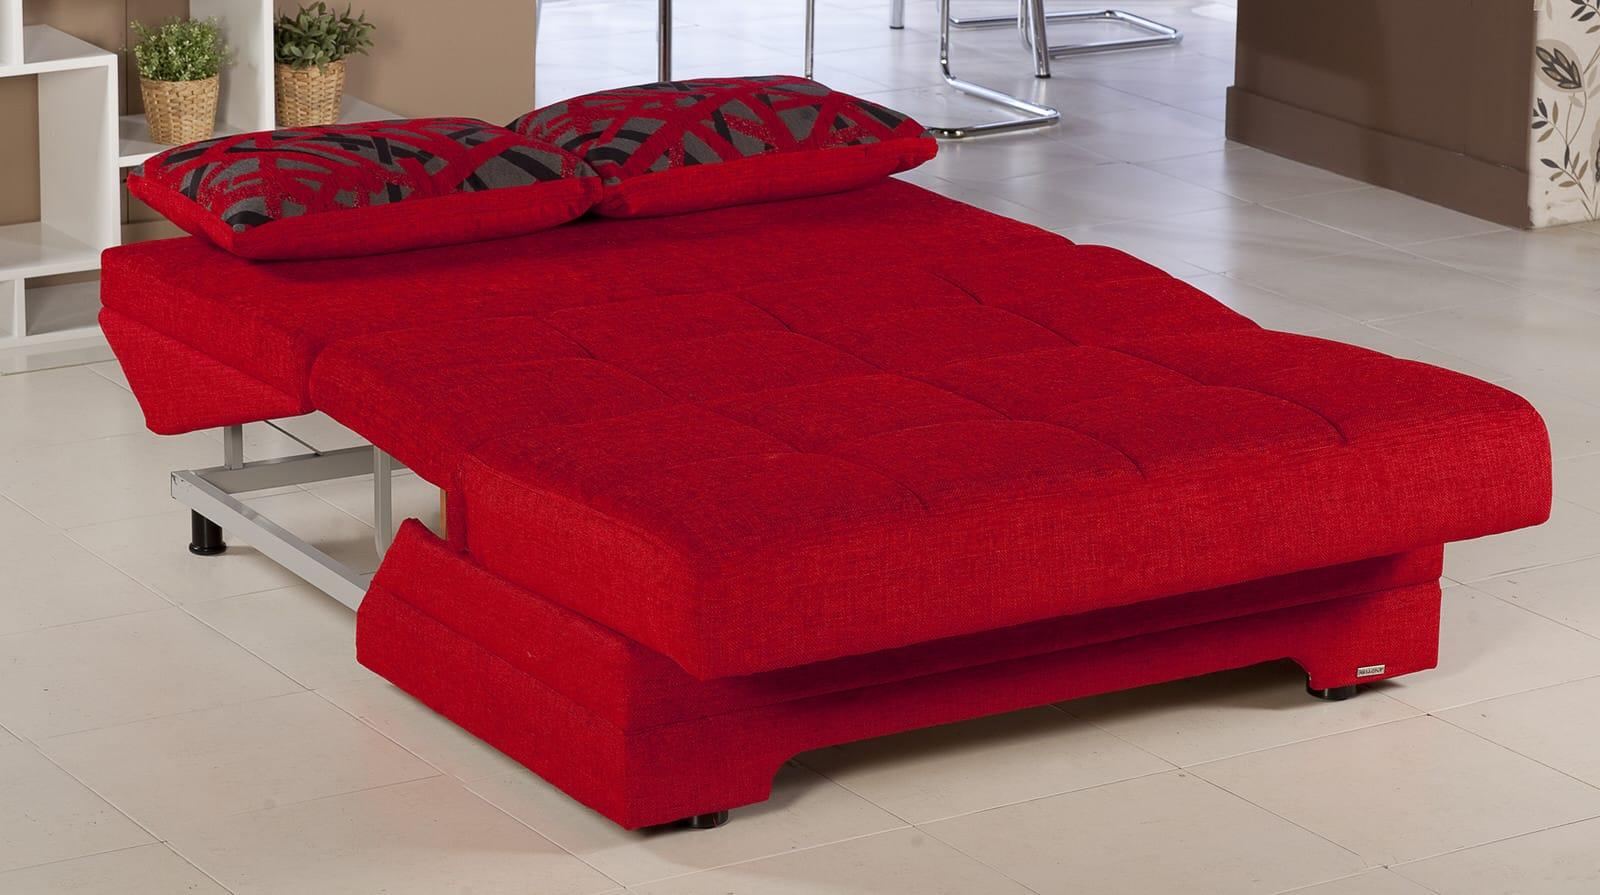 Twist Story Red Loveseat Sleeper by Istikbal Sunset